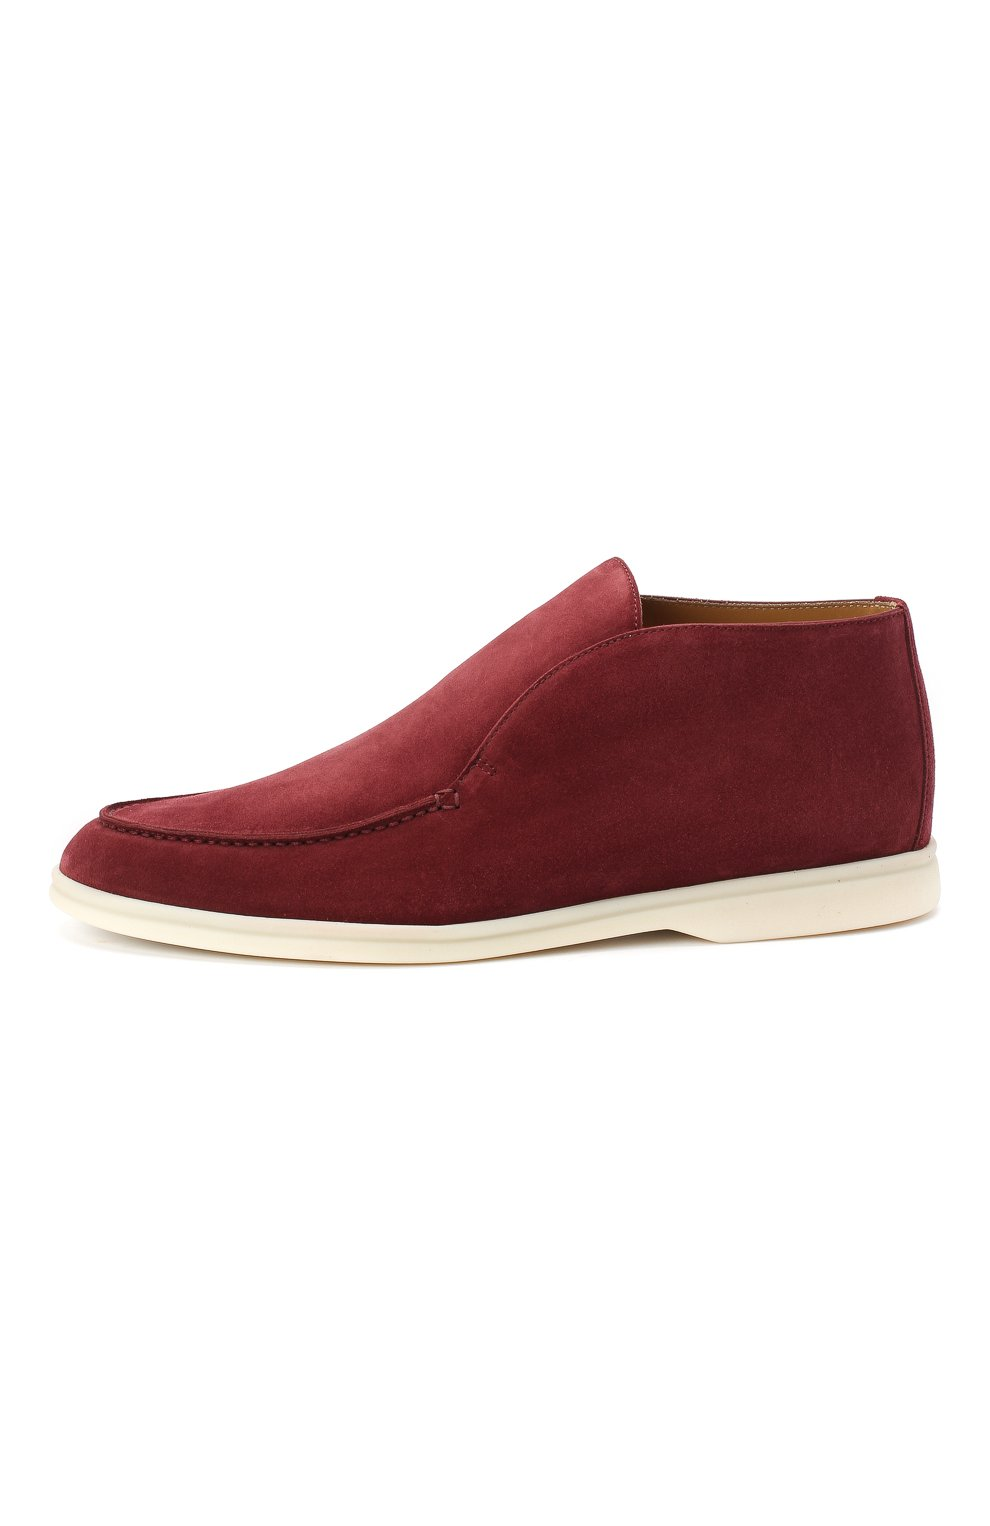 Мужские замшевые ботинки open walk LORO PIANA бордового цвета, арт. FAB4368 | Фото 3